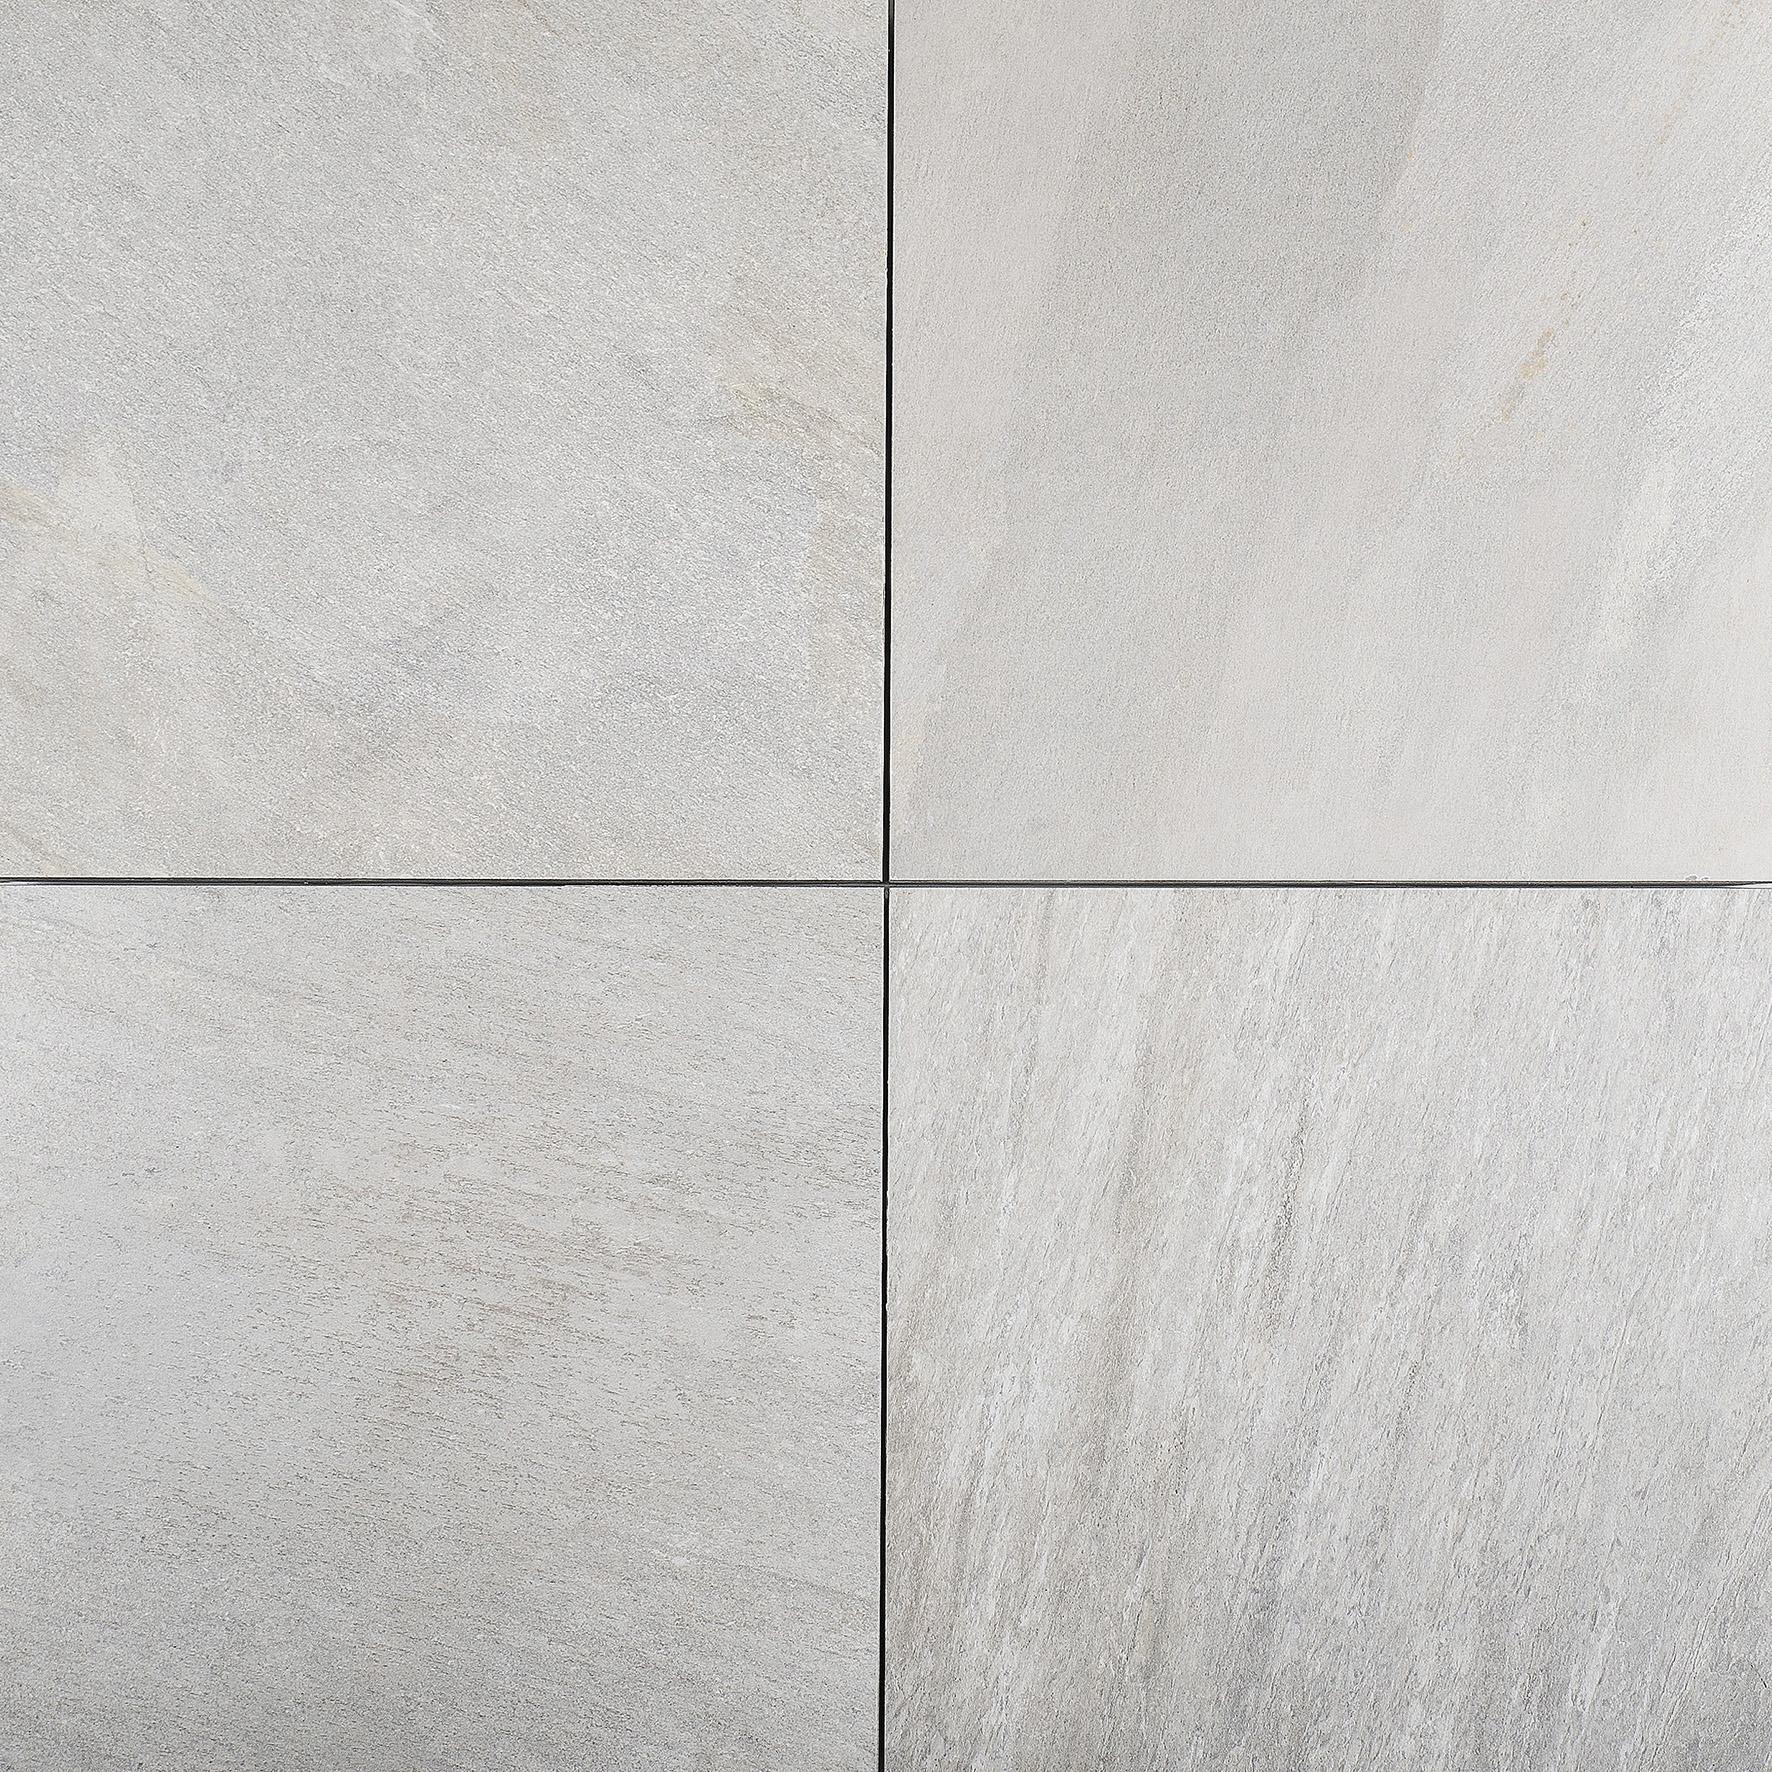 Gardenlux | Ceramento 60x60x4 | Cuarcita Gris